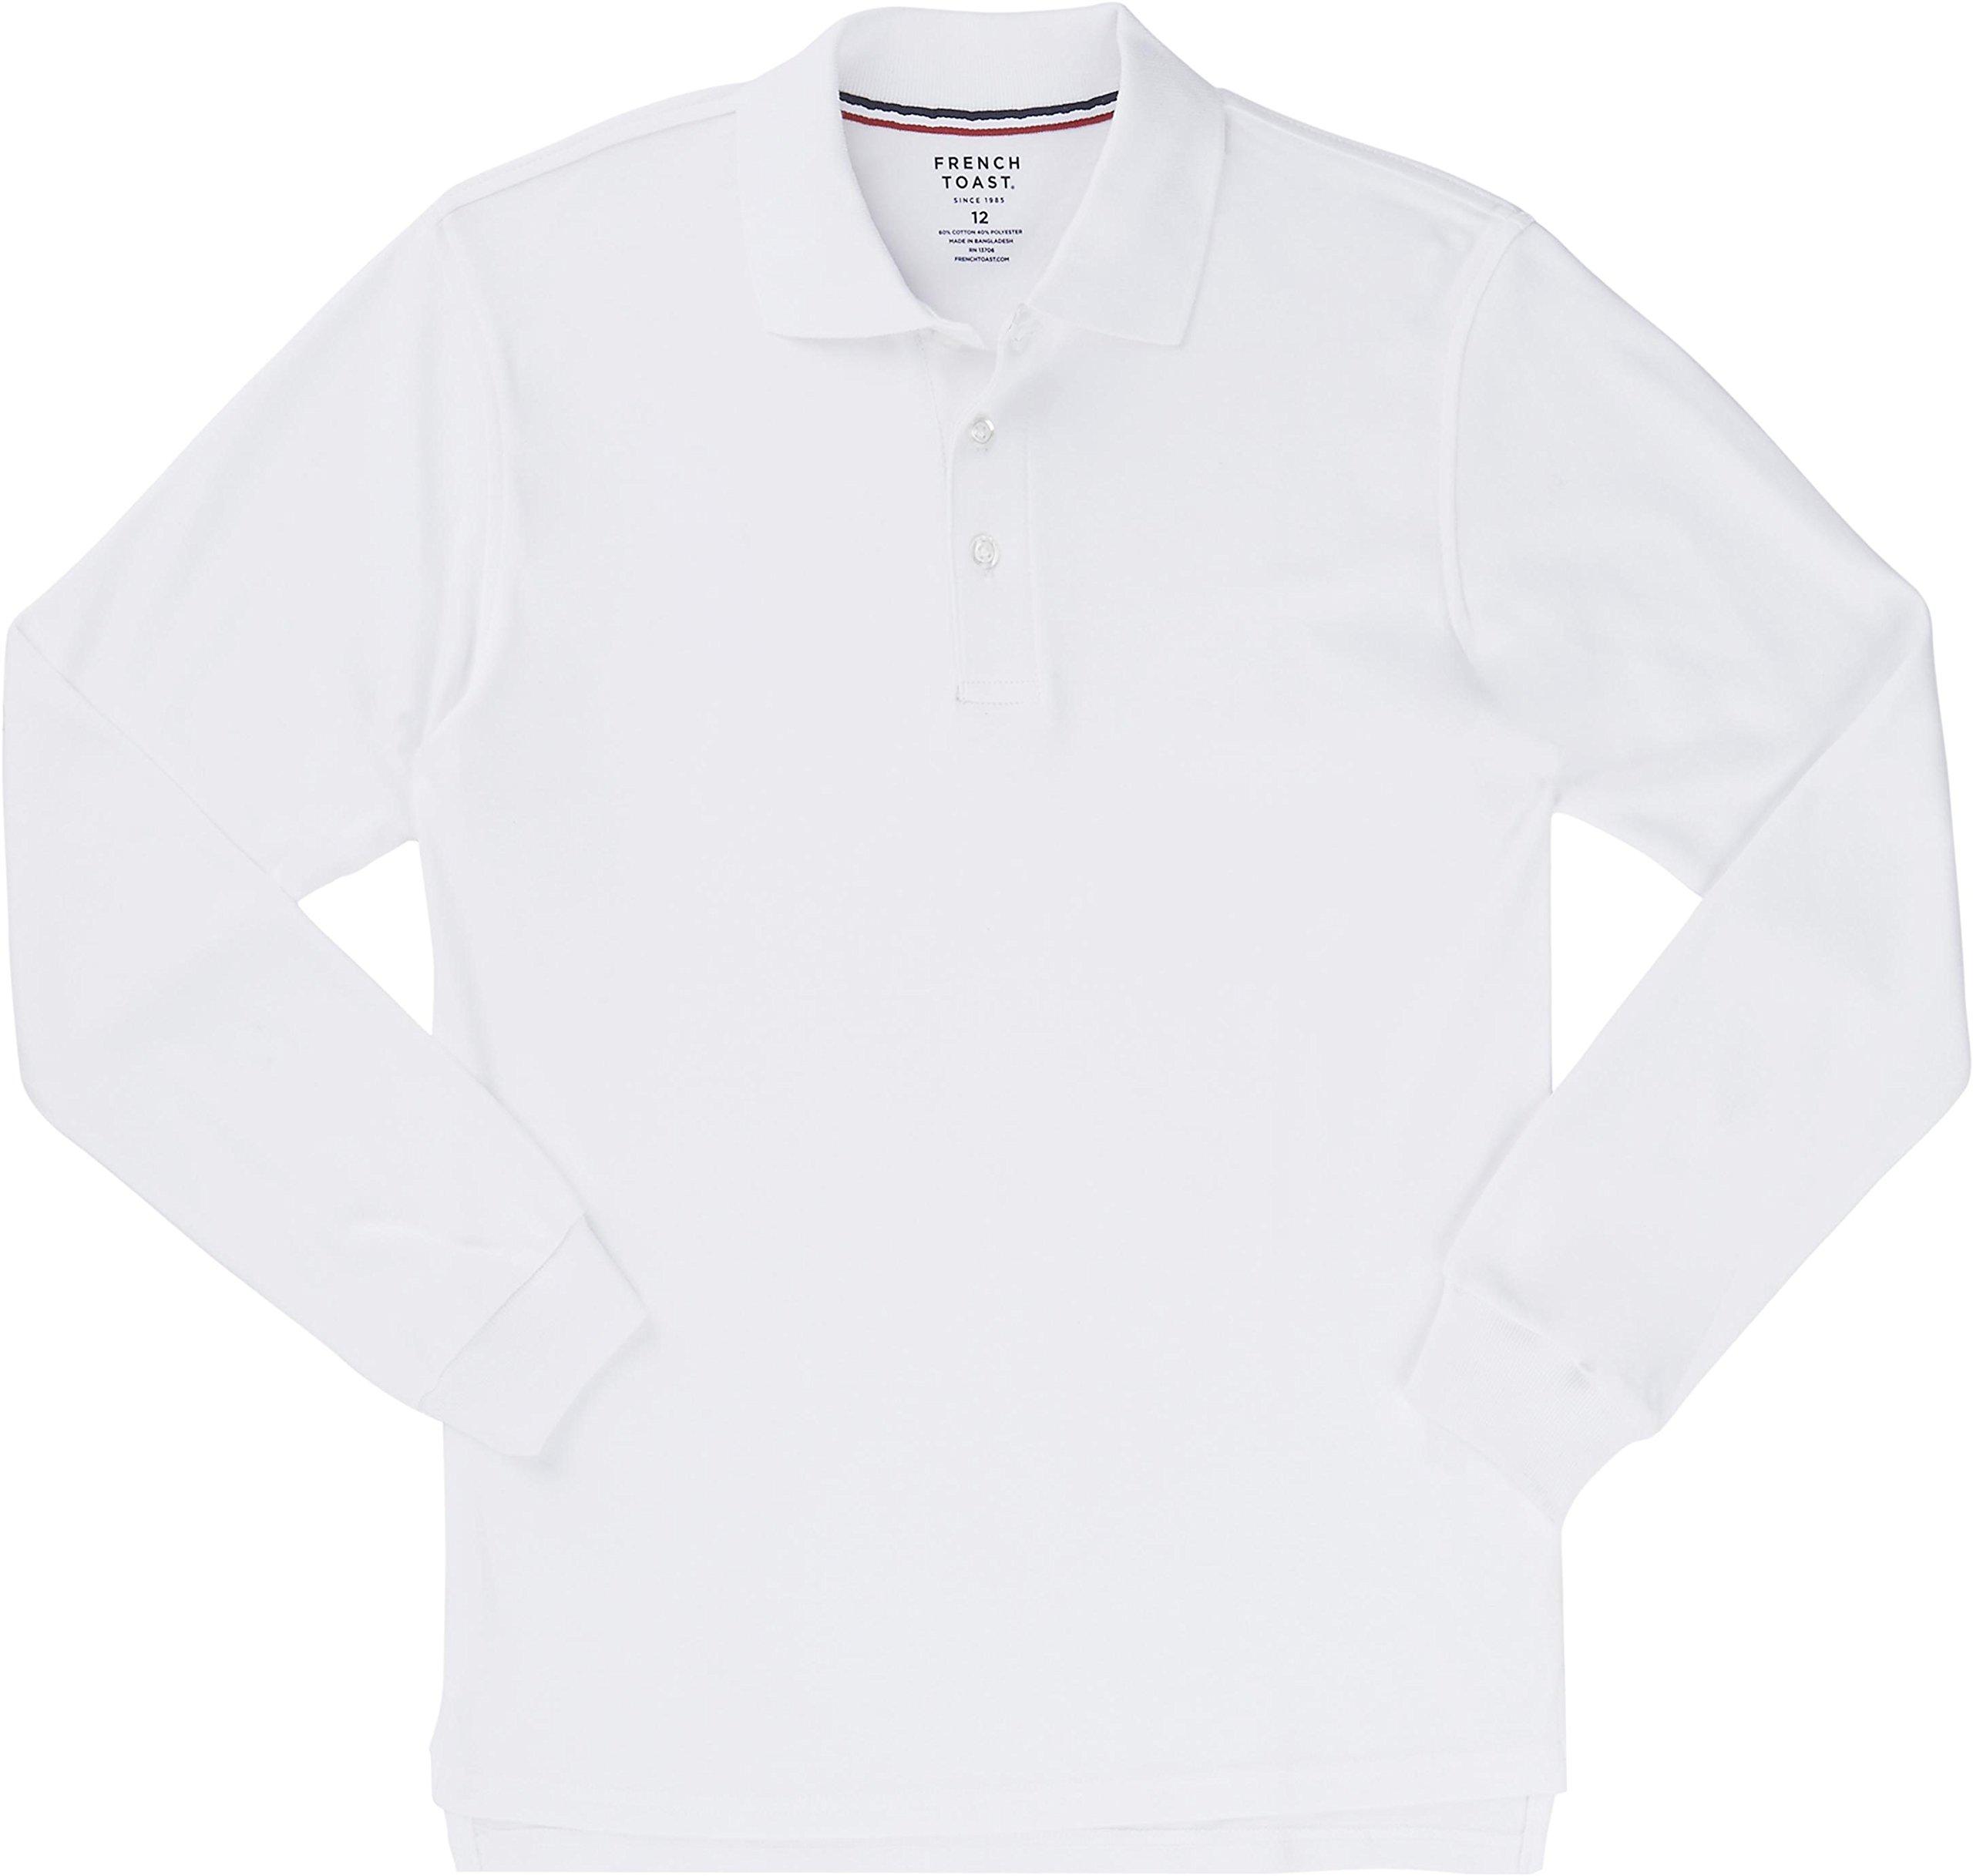 French Toast School Uniform Boys Long Sleeve Interlock Knit Polo Shirt, White, Medium (8)